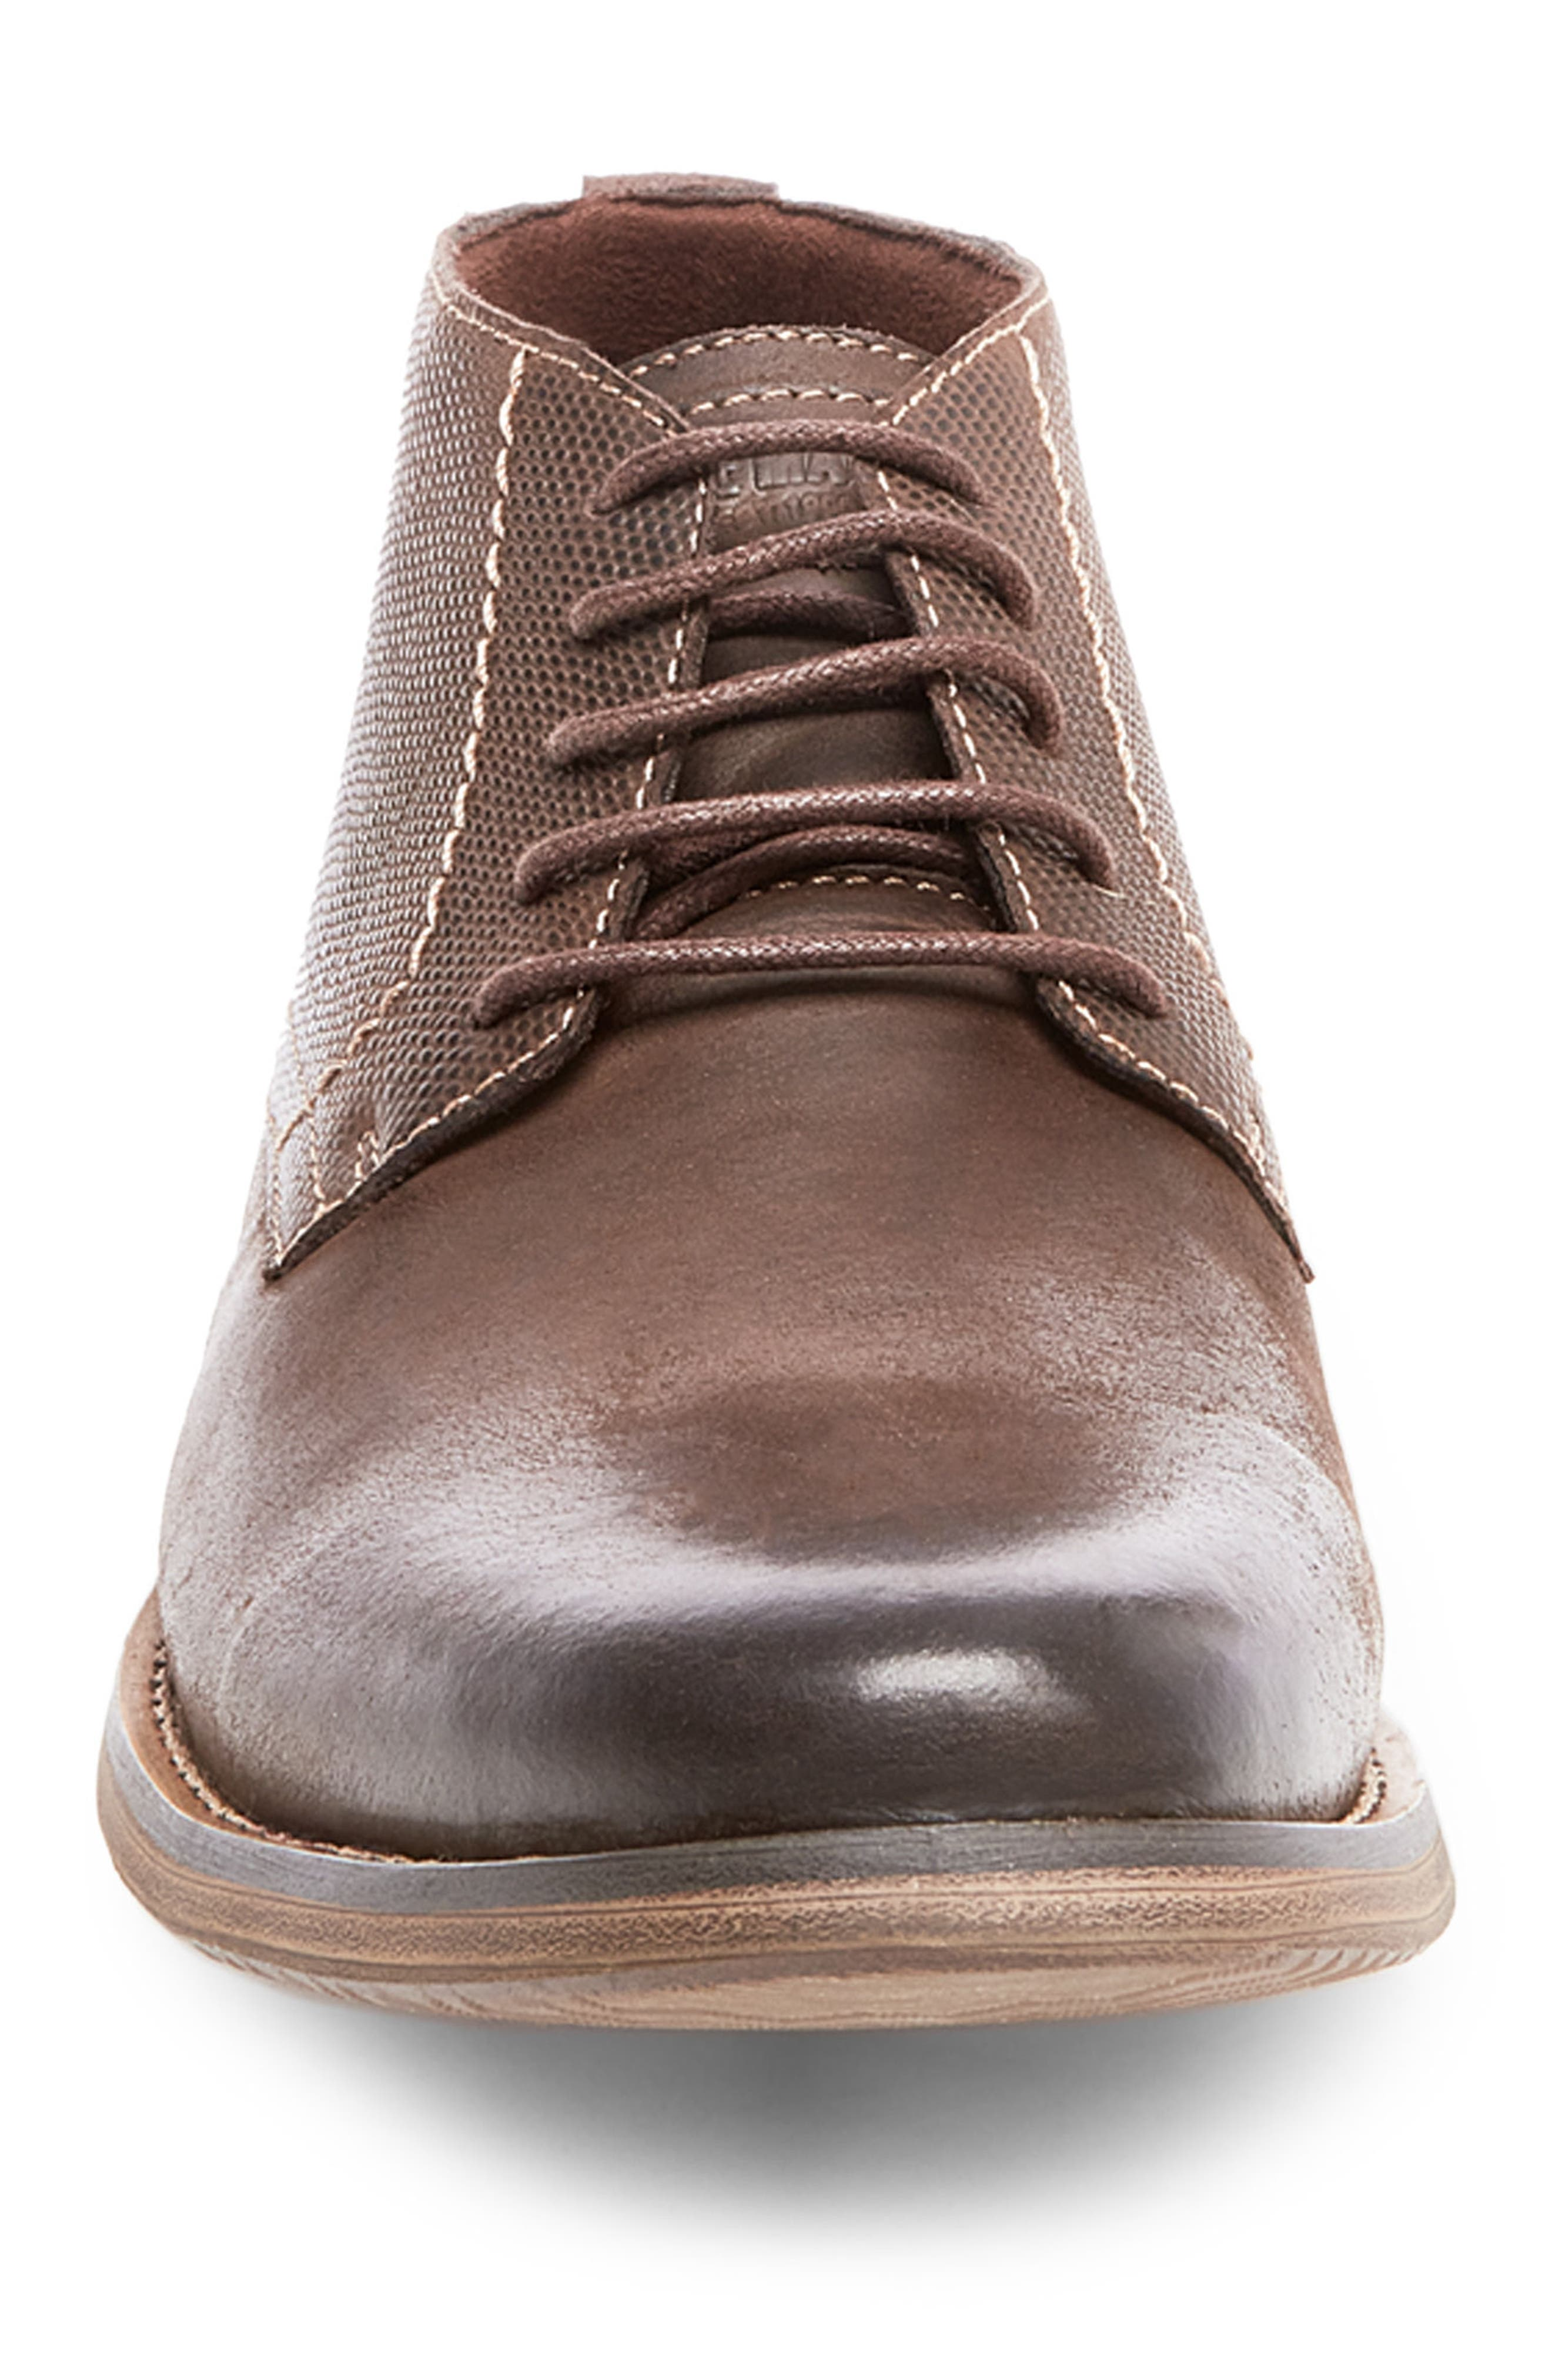 Pieter Leather Chukka Boot,                             Alternate thumbnail 4, color,